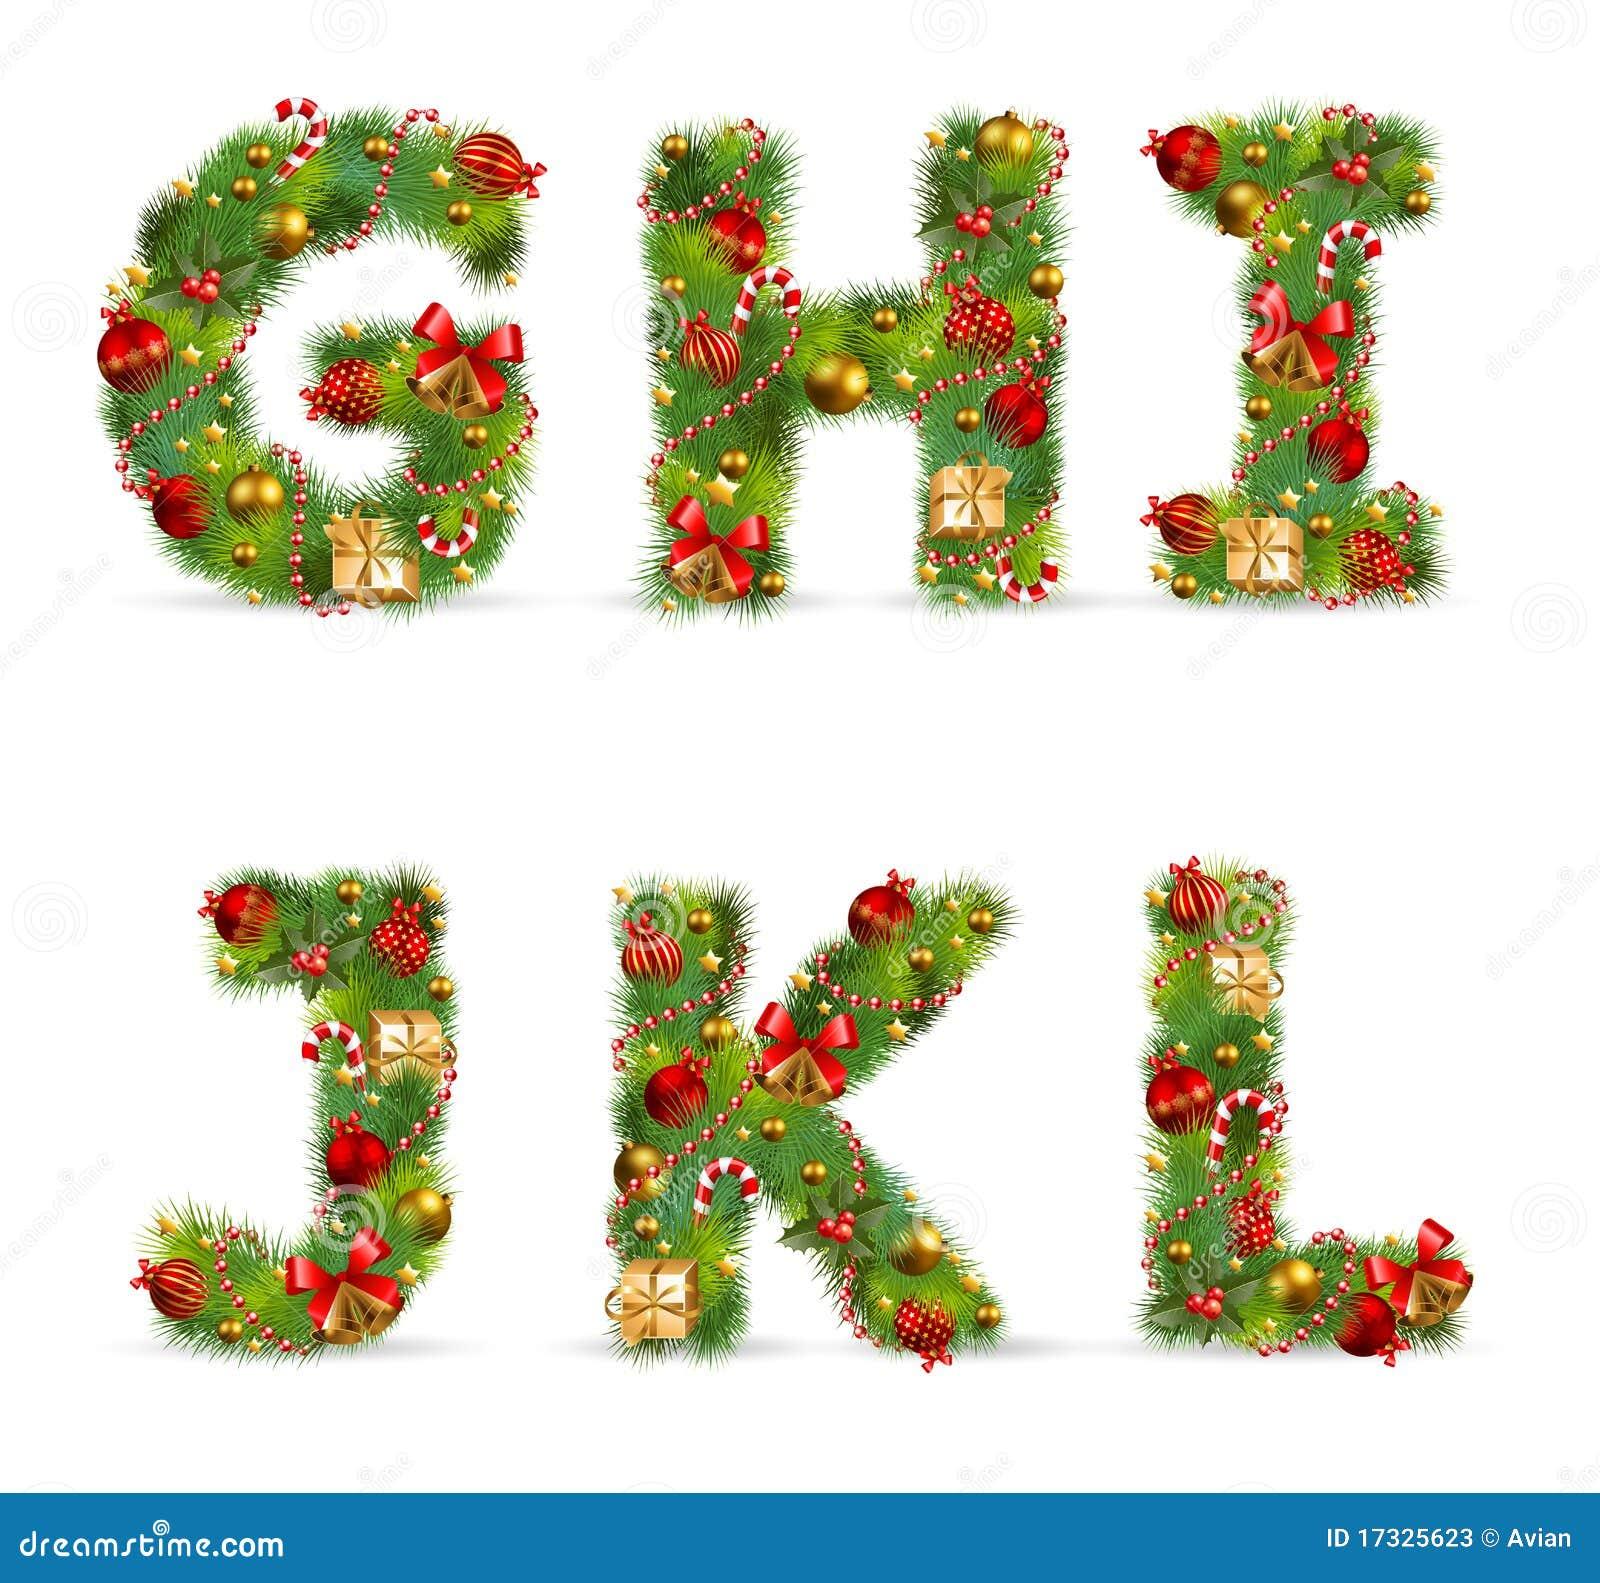 GHIJKL, Christmas Tree Font Stock Photos - Image: 17325623